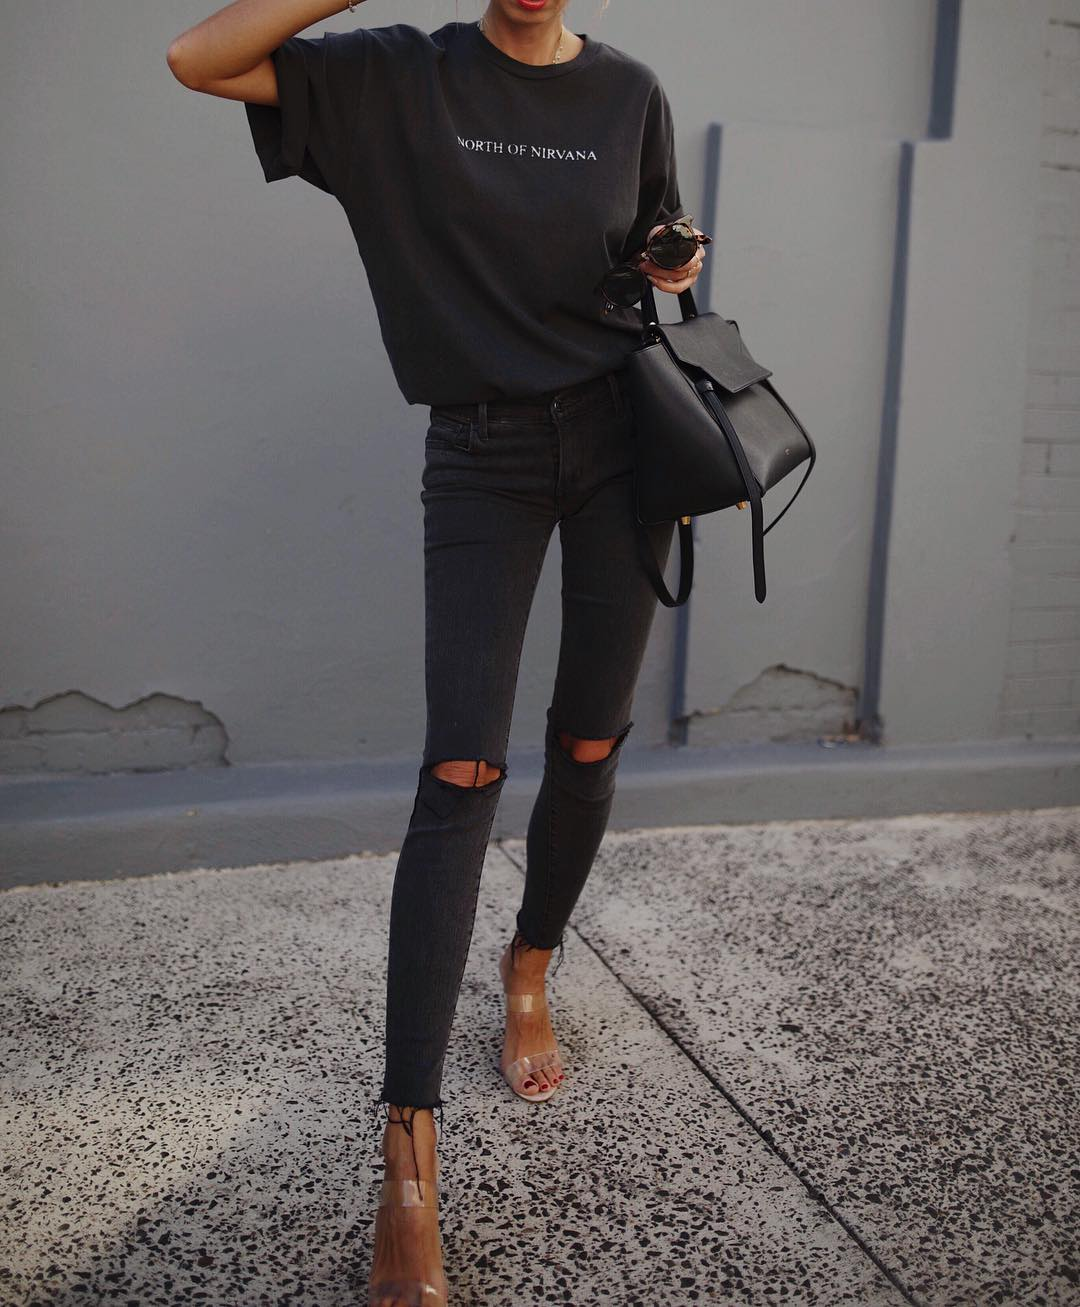 джинсы и футболка фото 9